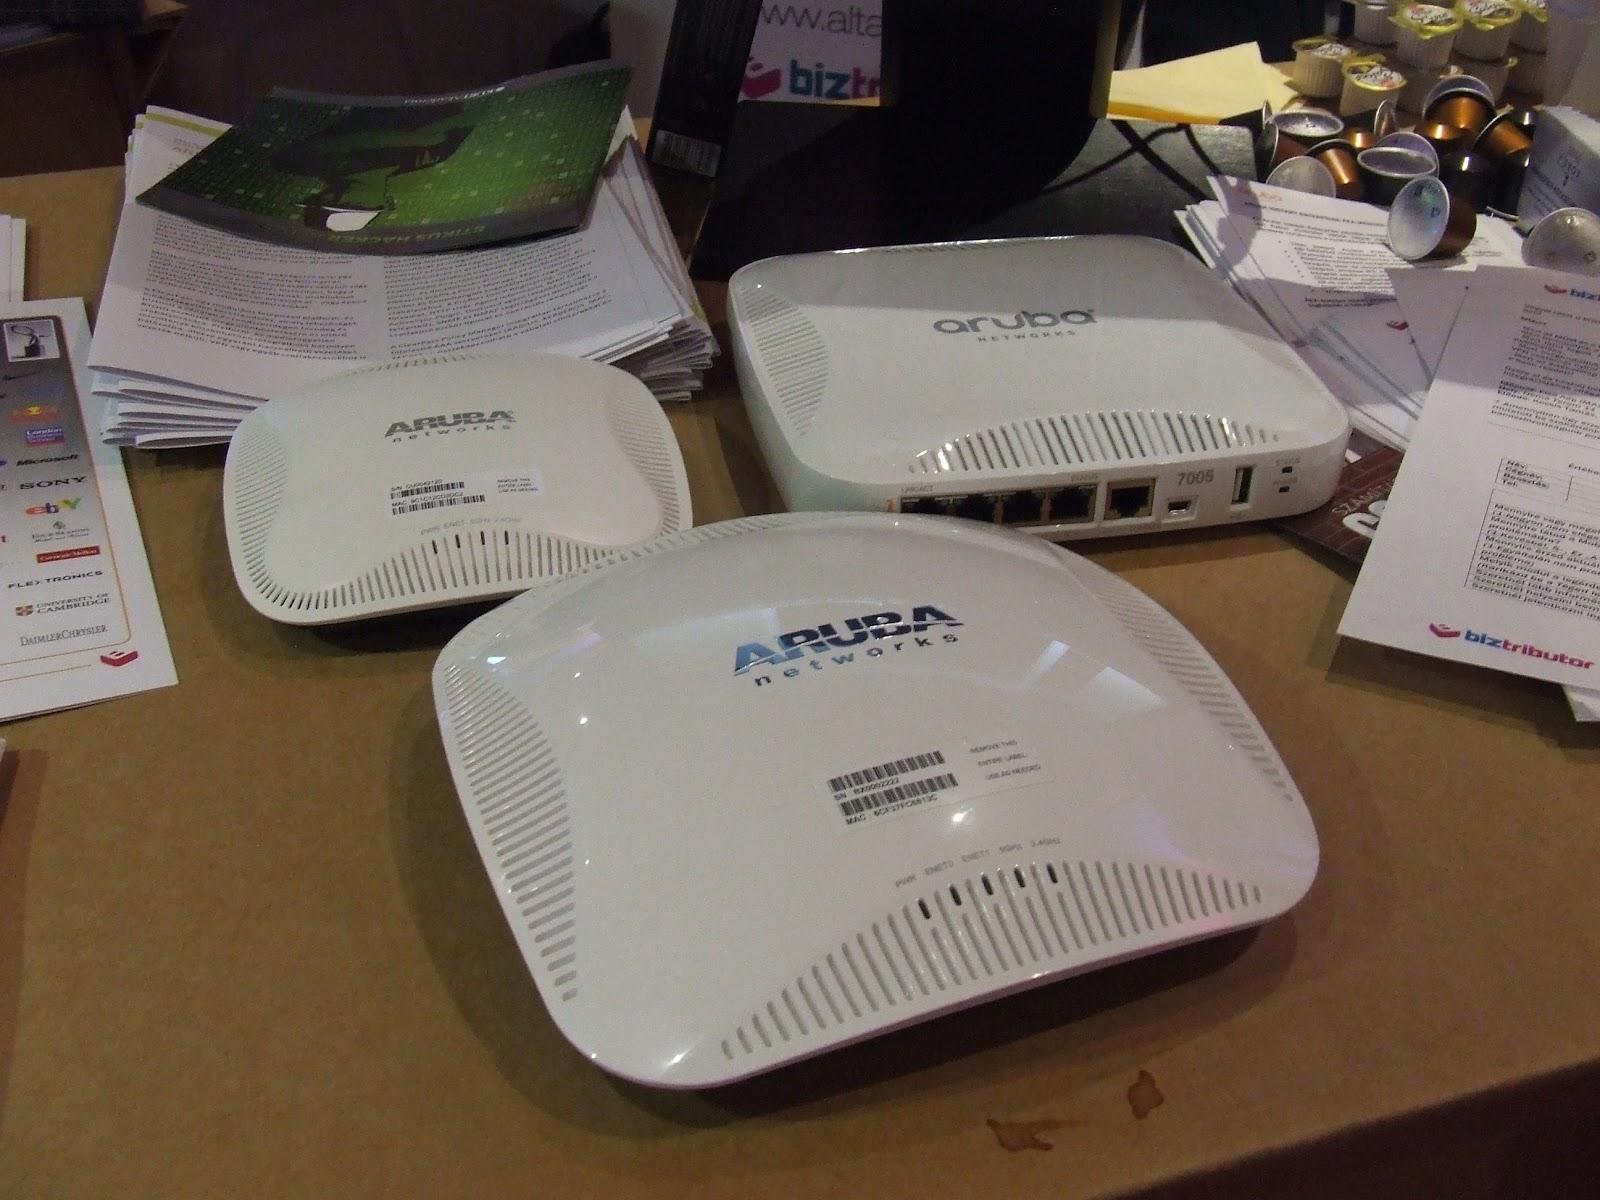 Aruba Wi-fi Router